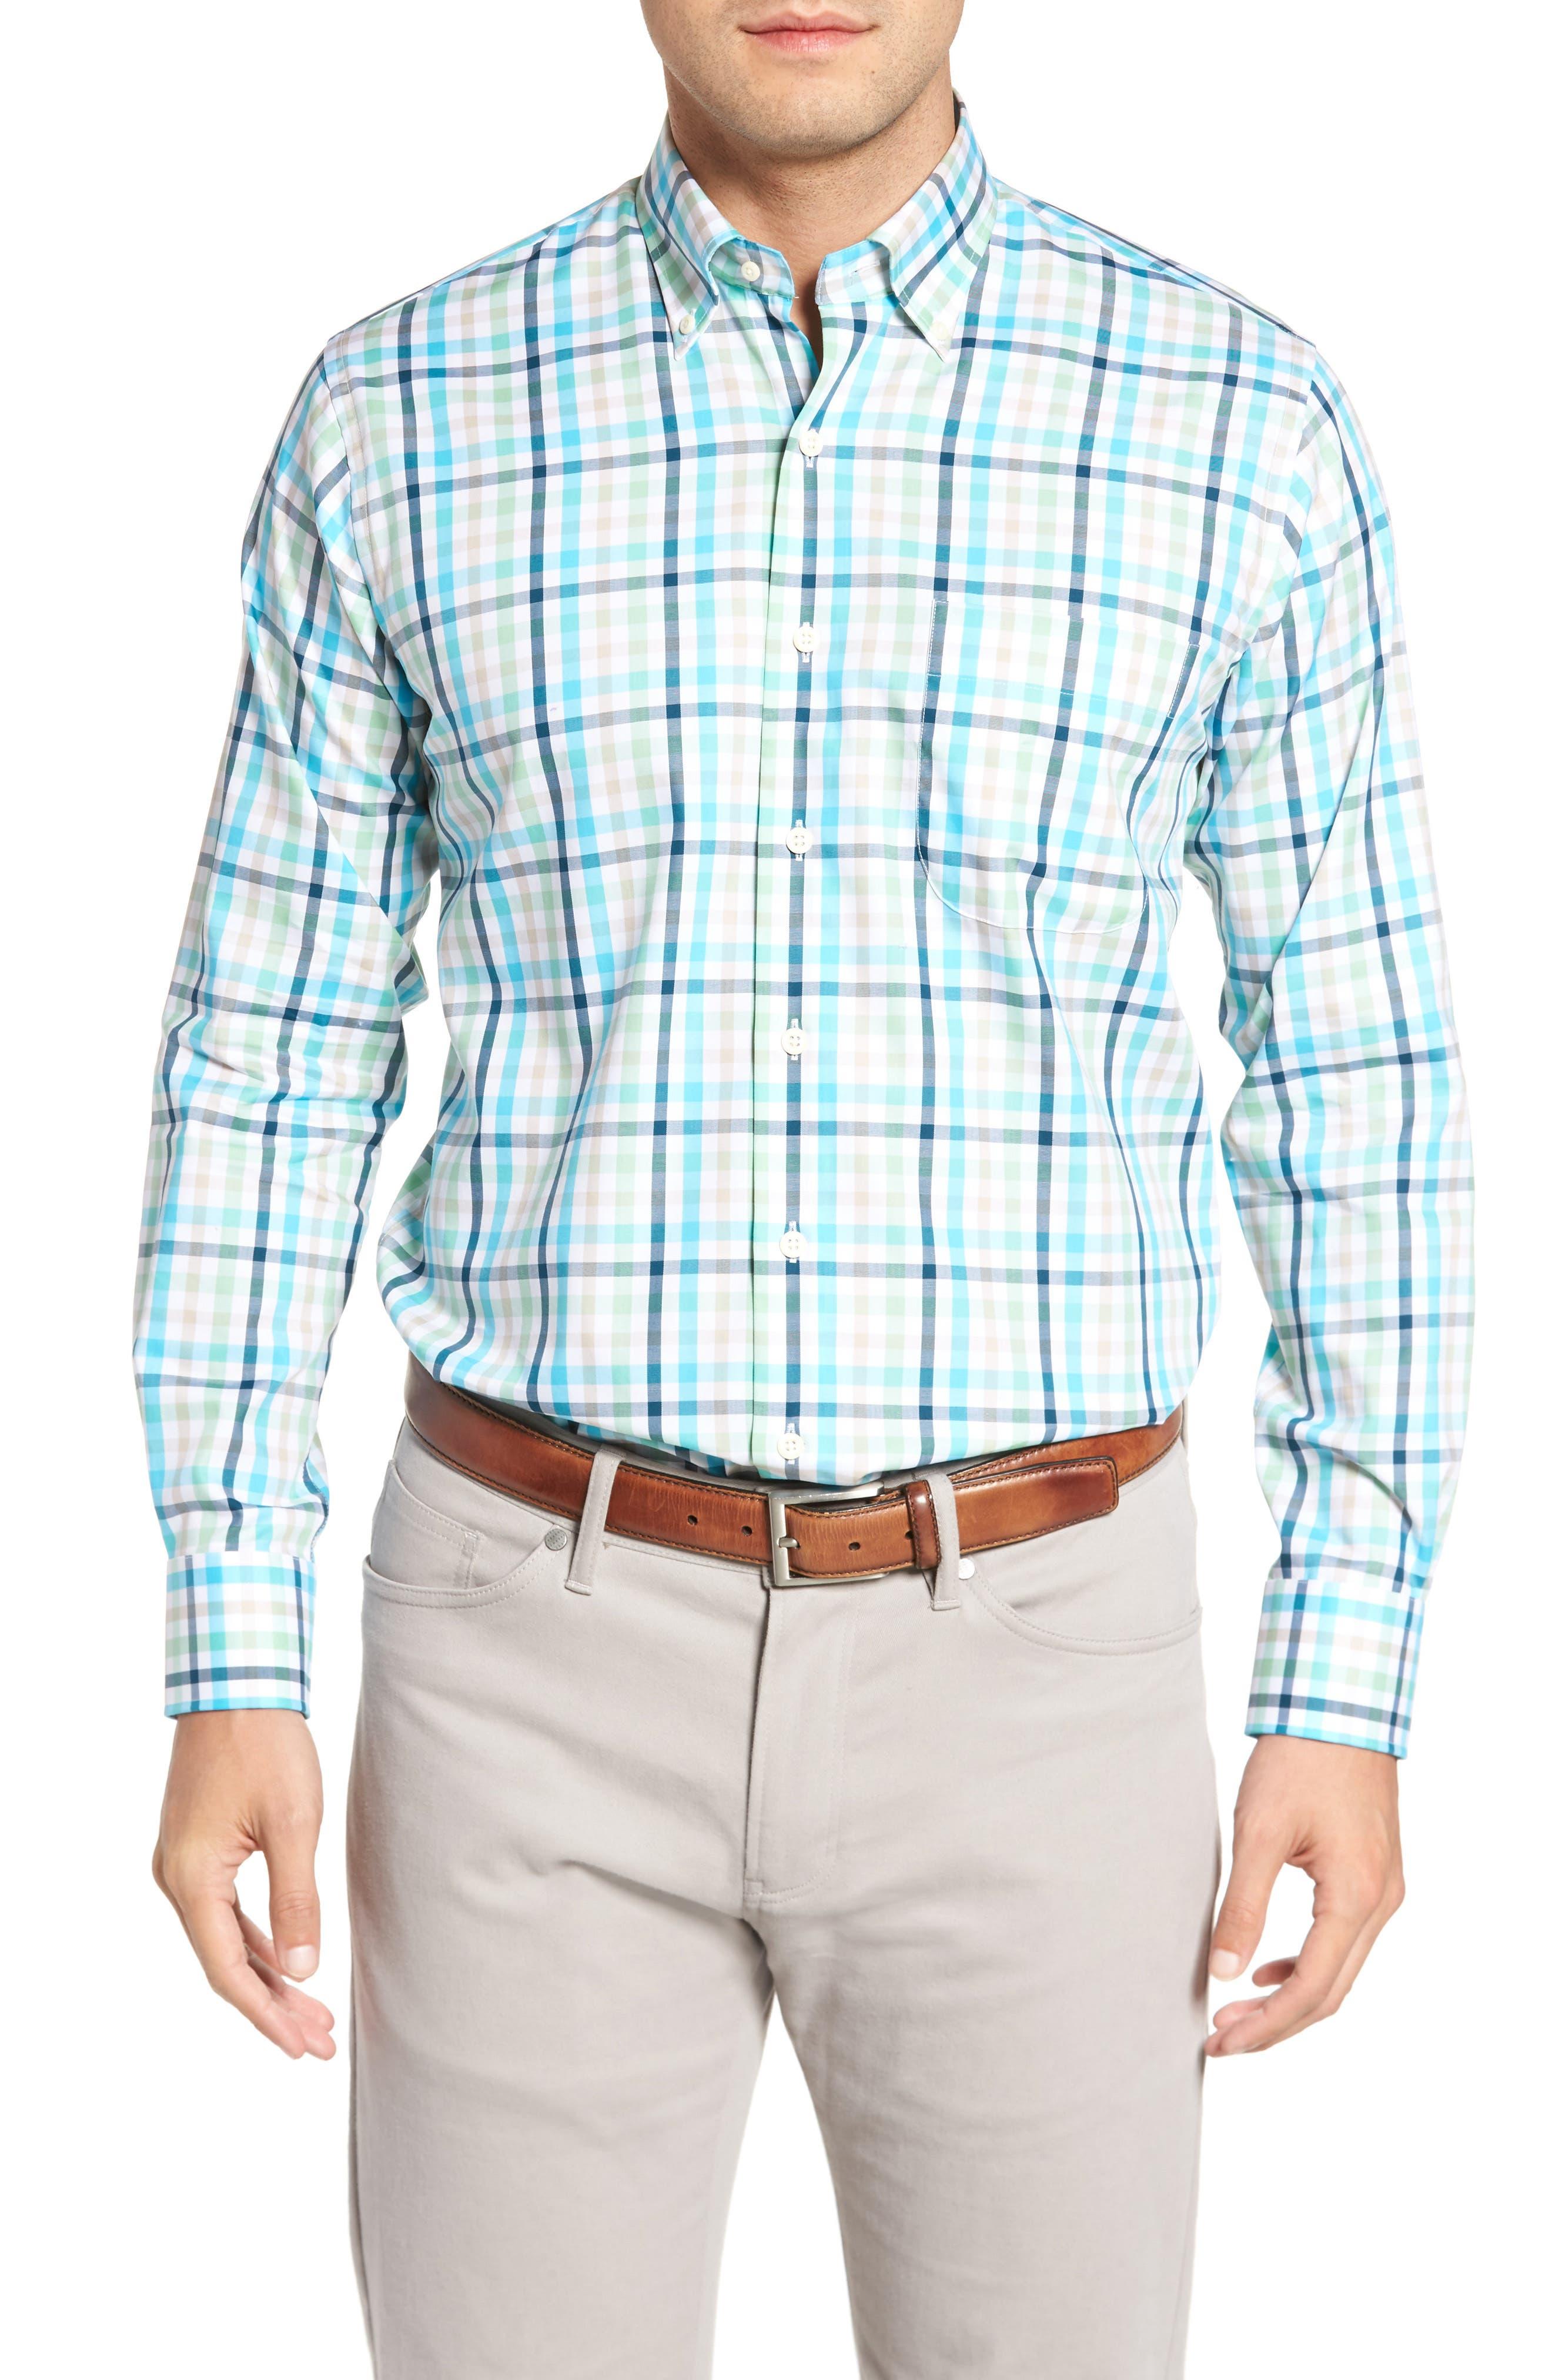 Alternate Image 1 Selected - Peter Millar Classic Fit Crown Ease Kohala Check Sport Shirt